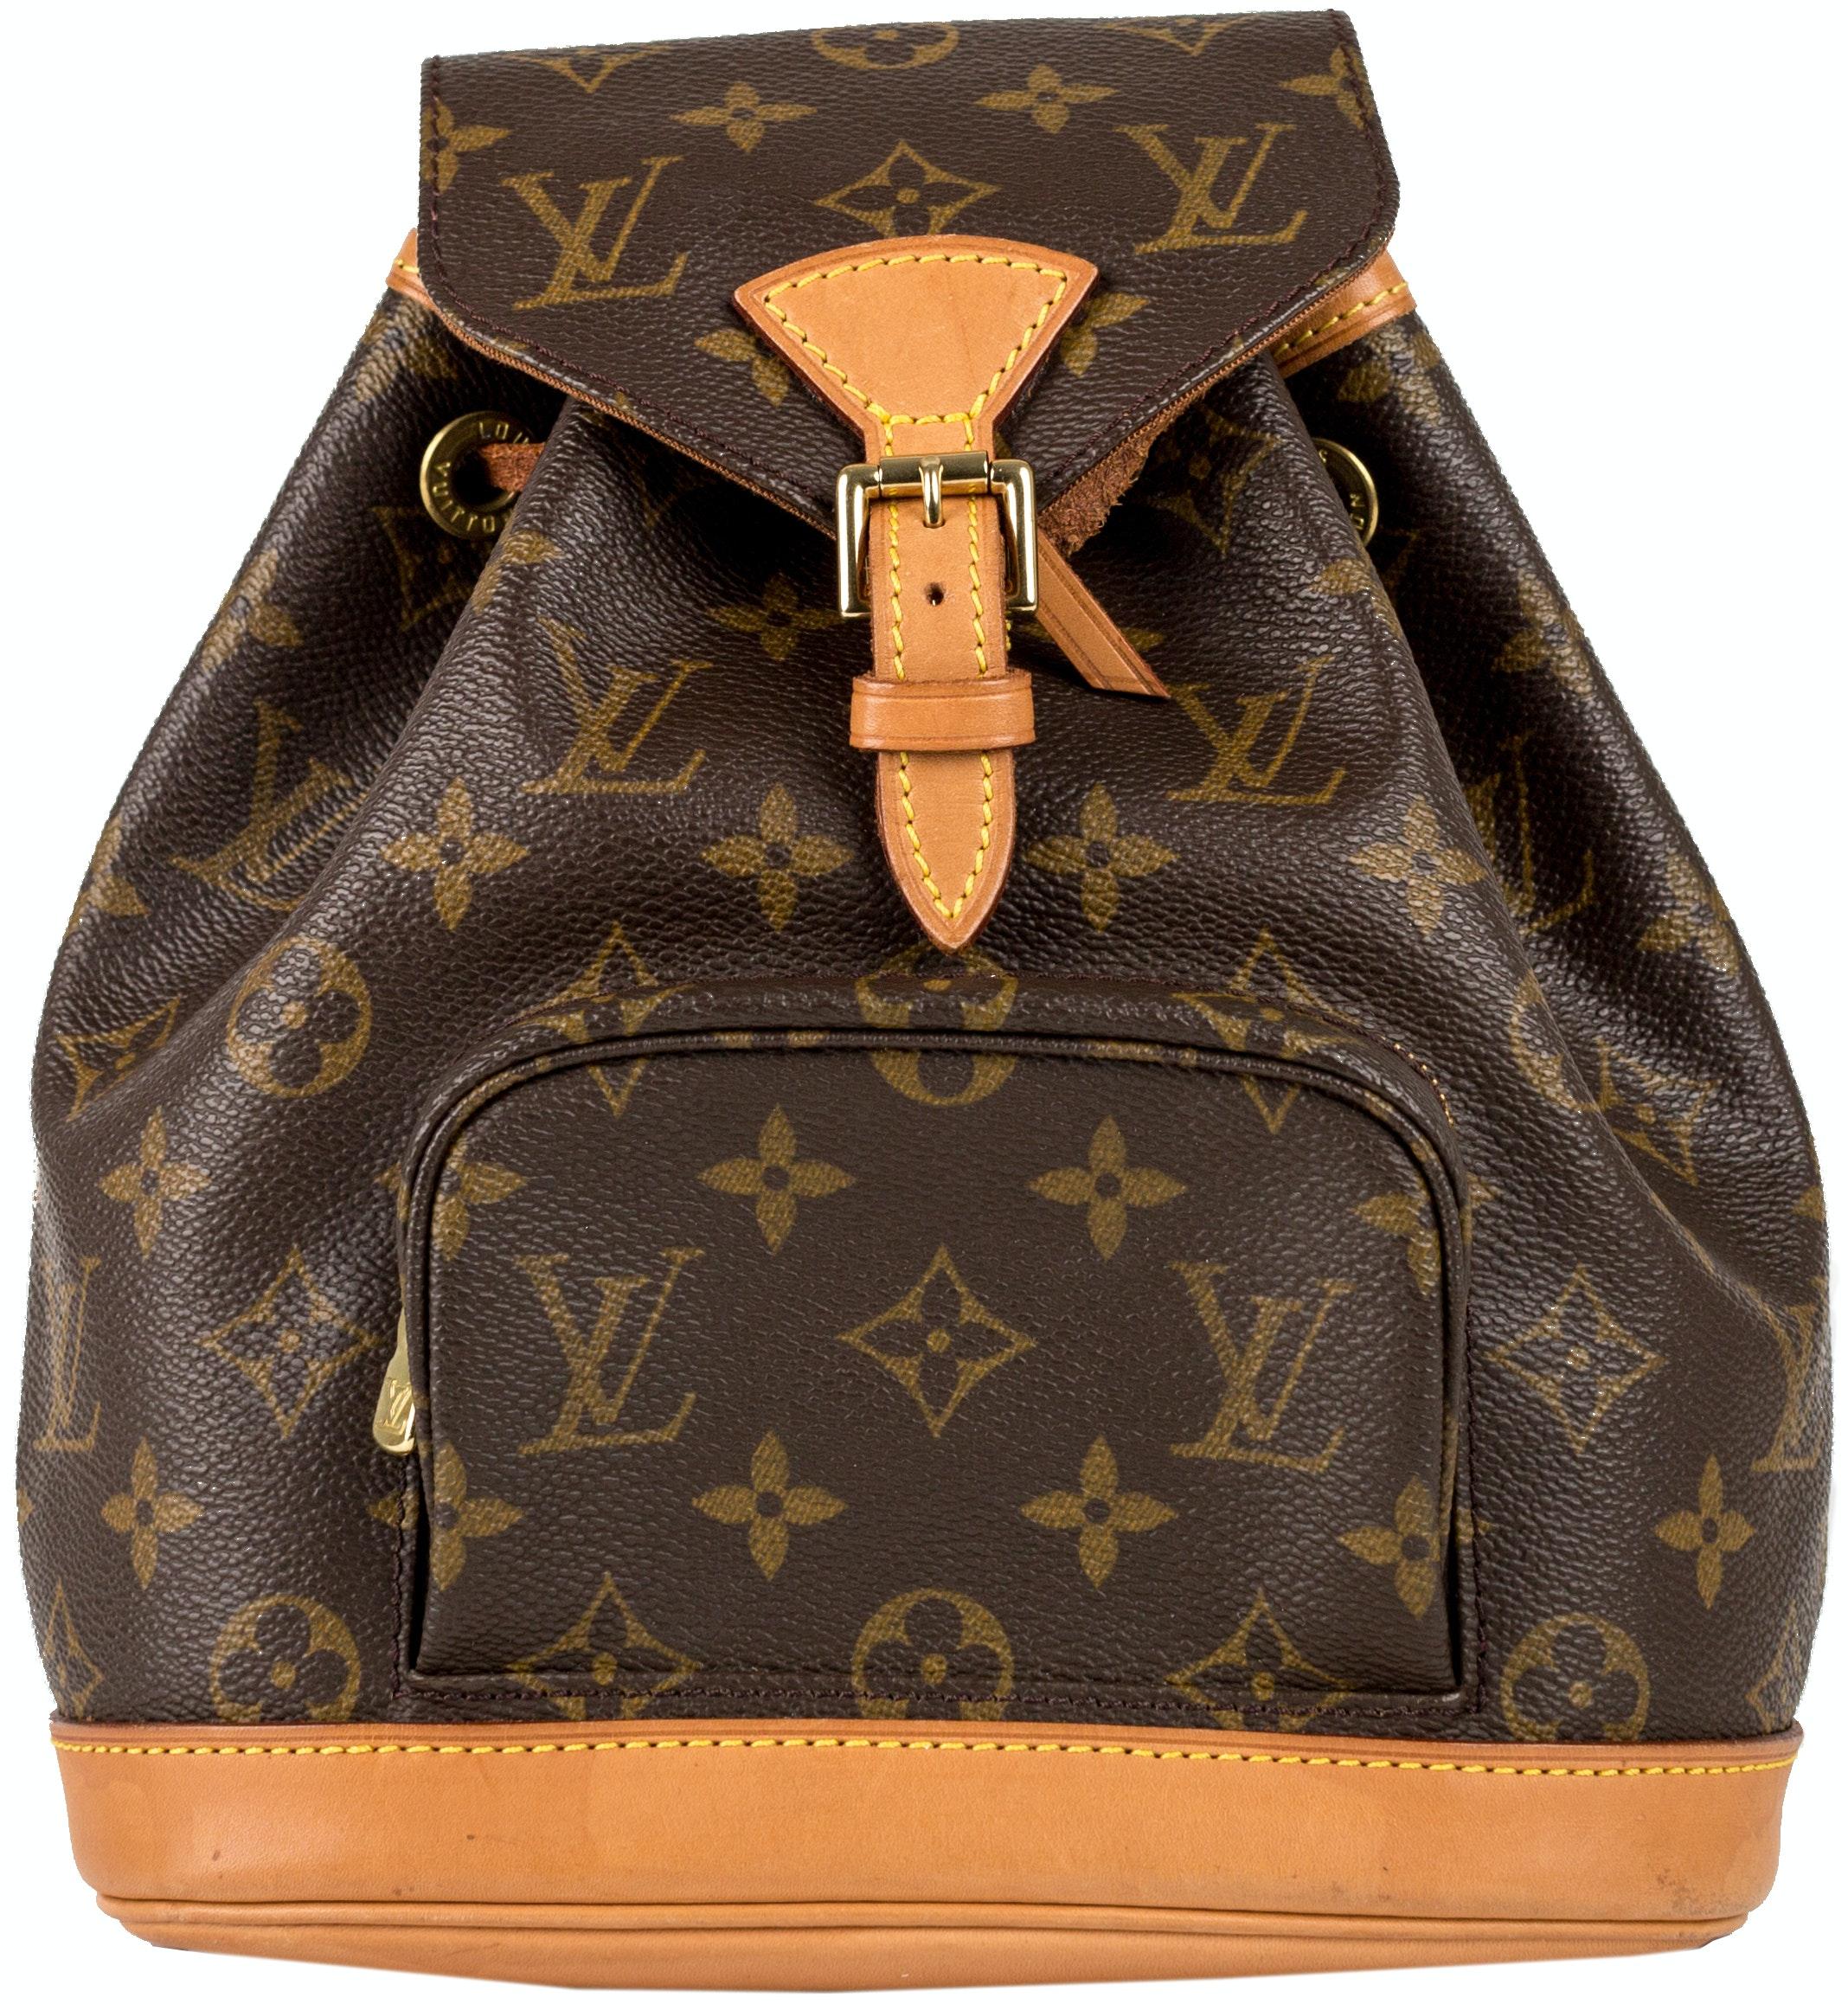 Louis Vuitton Montsouris Monogram MM Brown